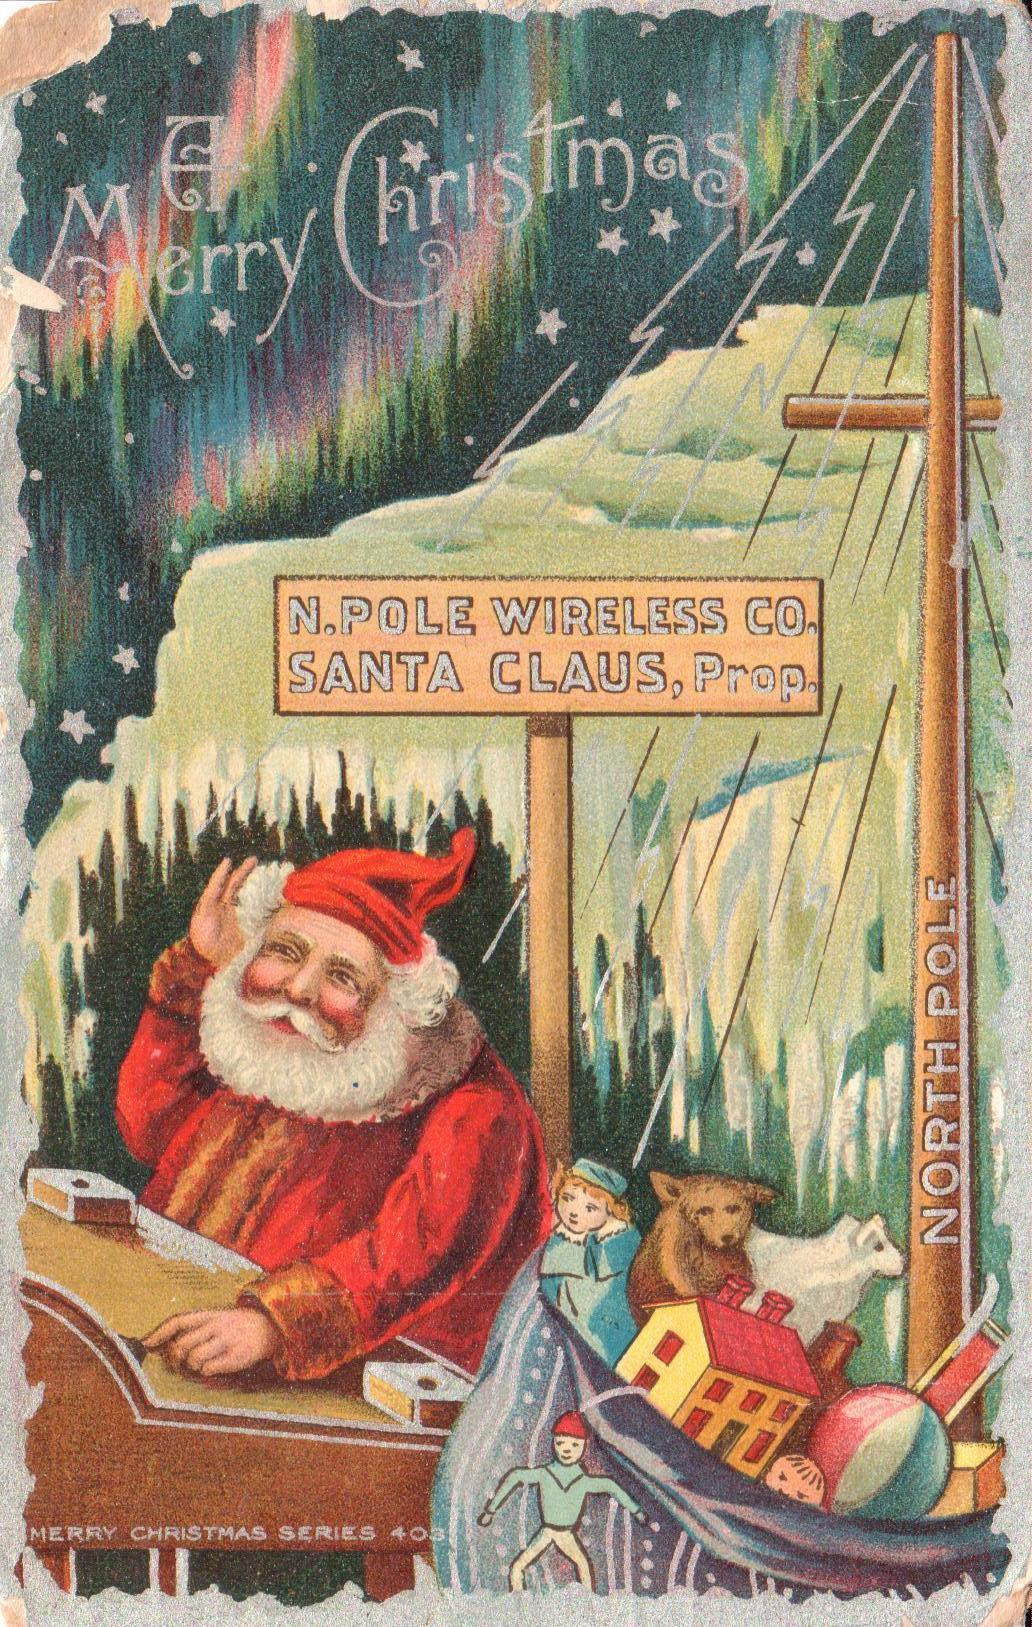 N-Pole-Wireless-Co-Santa-Claus-Proprietor-ca 1900 Kemper Chambers Collection